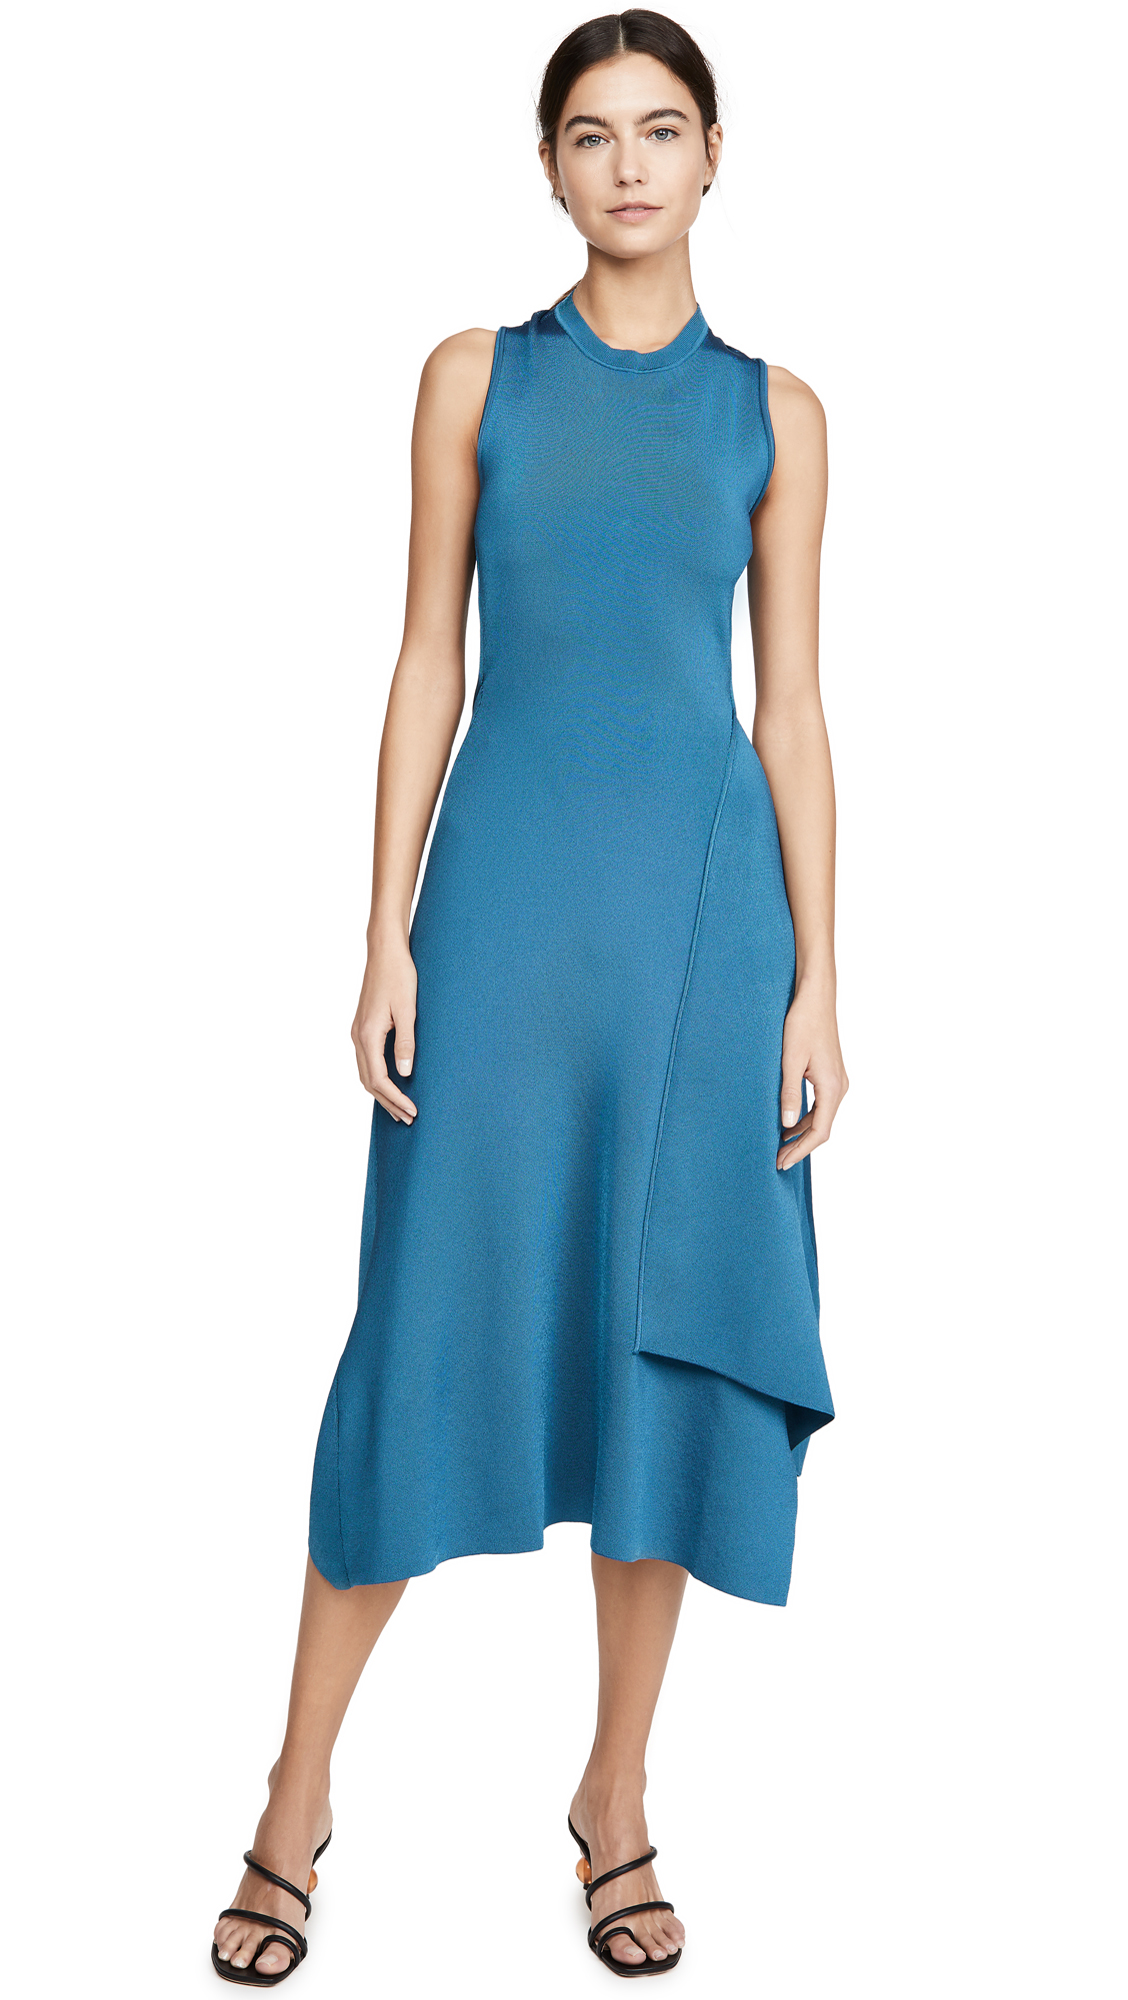 Victoria Beckham Twist Back Midi Dress - 50% Off Sale